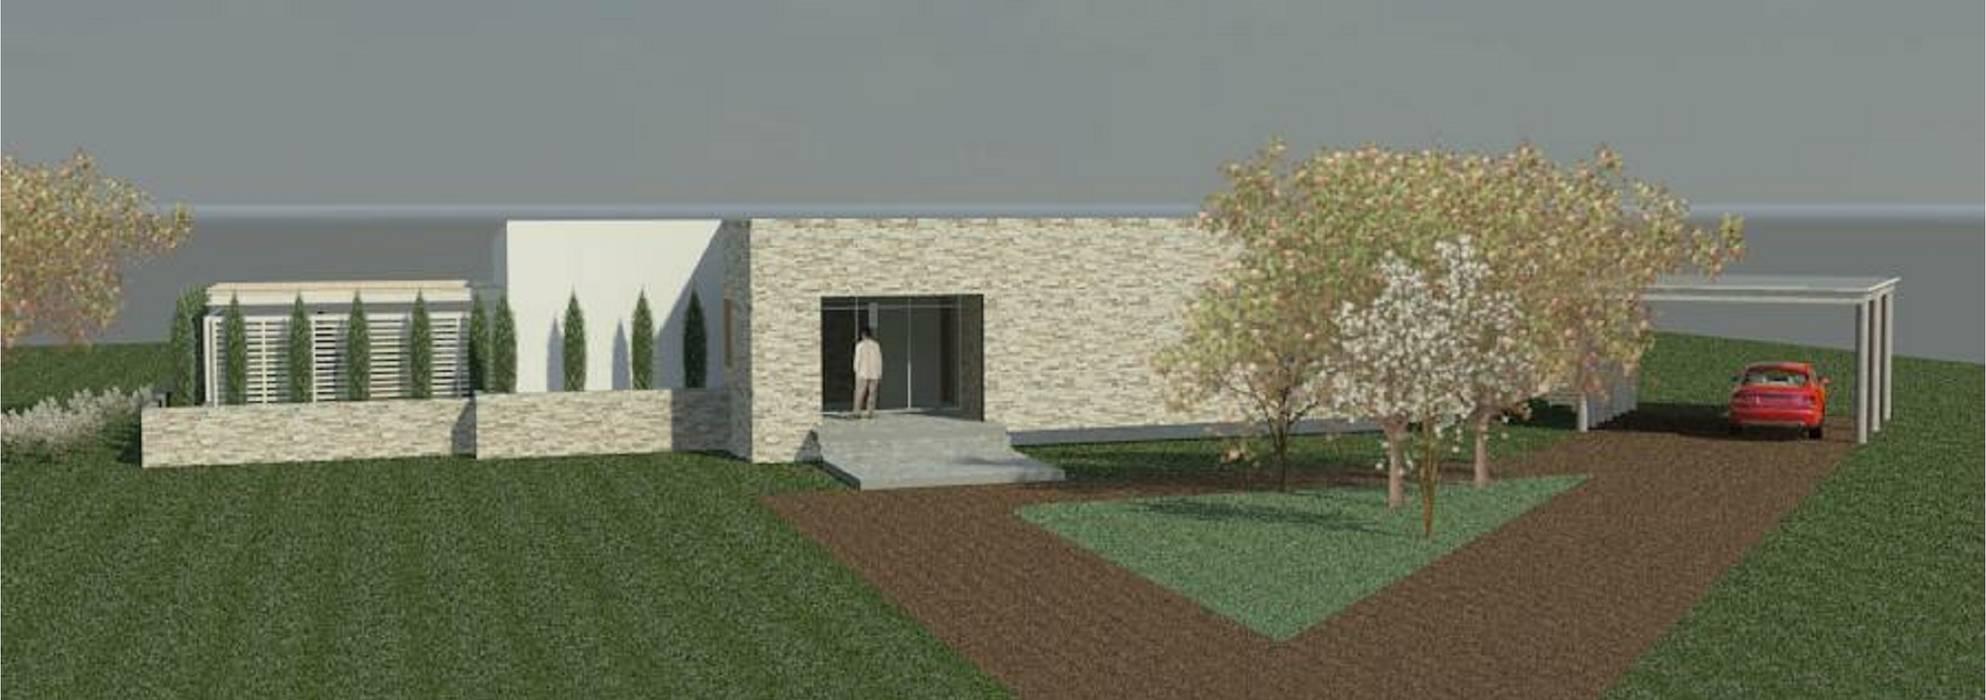 Casa en Talagante Arquitectura Amanda Perez Feliú